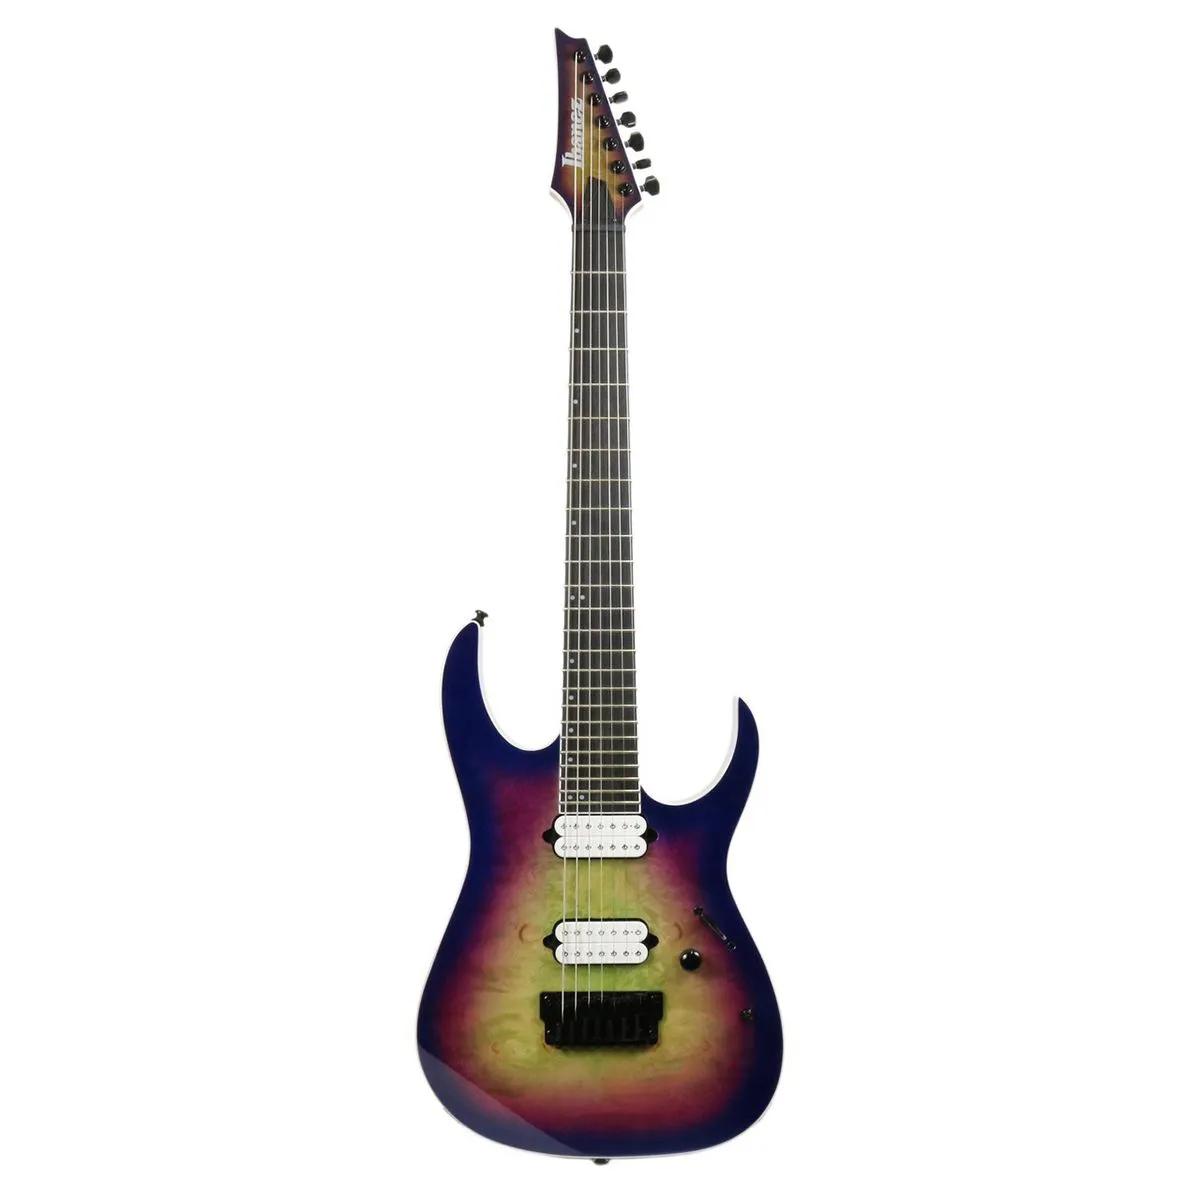 Guitarra 7 Cordas Ibanez RGIX7 Iron Label Northern Lights burst